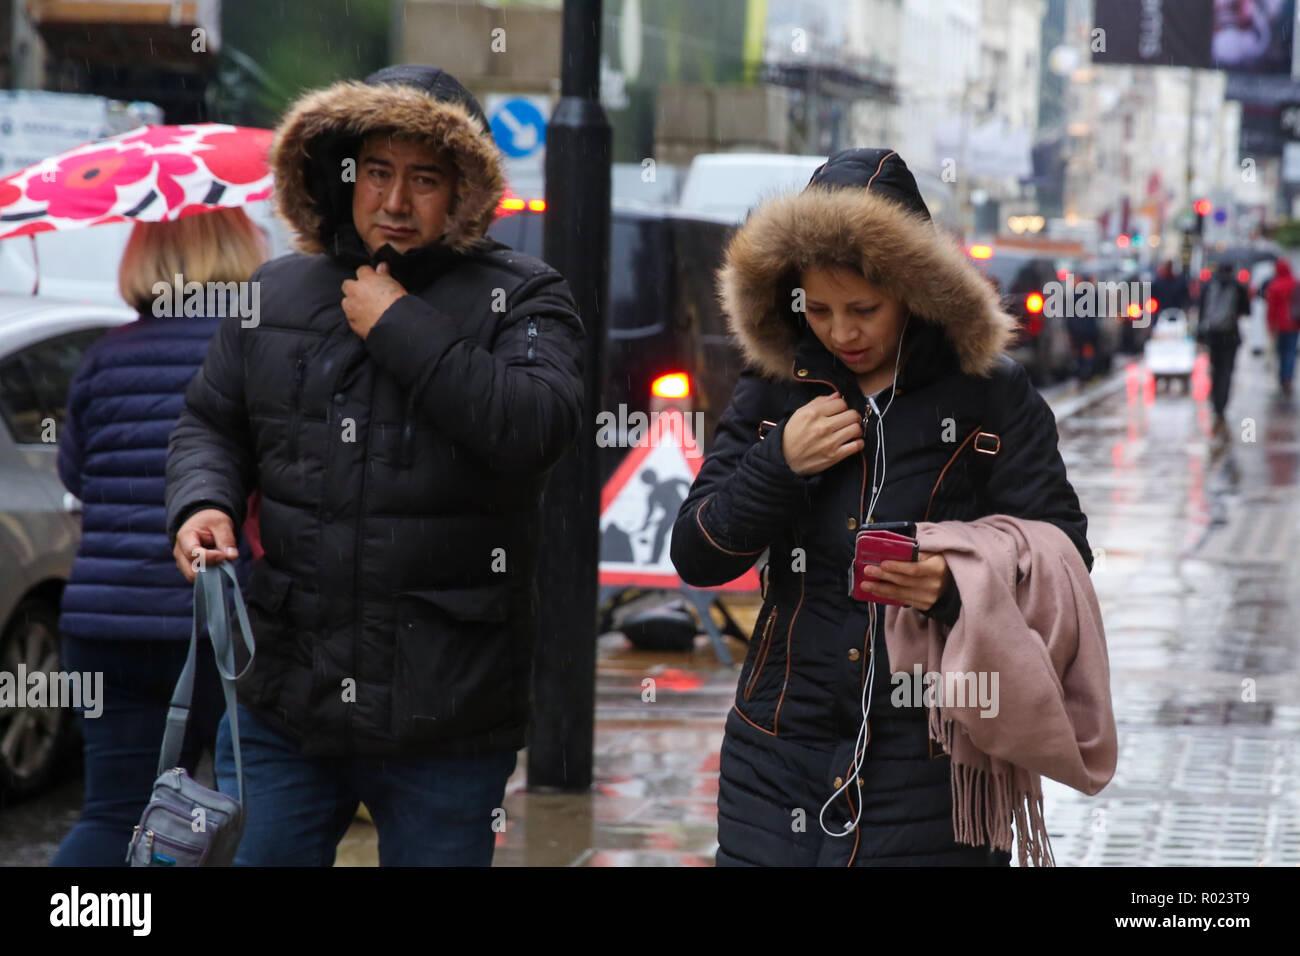 Oxford Street, London, UK. 1st Nov, 2018. Shoppers shelter from the rain beneath umbrellas as rain falls in London. Credit: Dinendra Haria/Alamy Live News Stock Photo